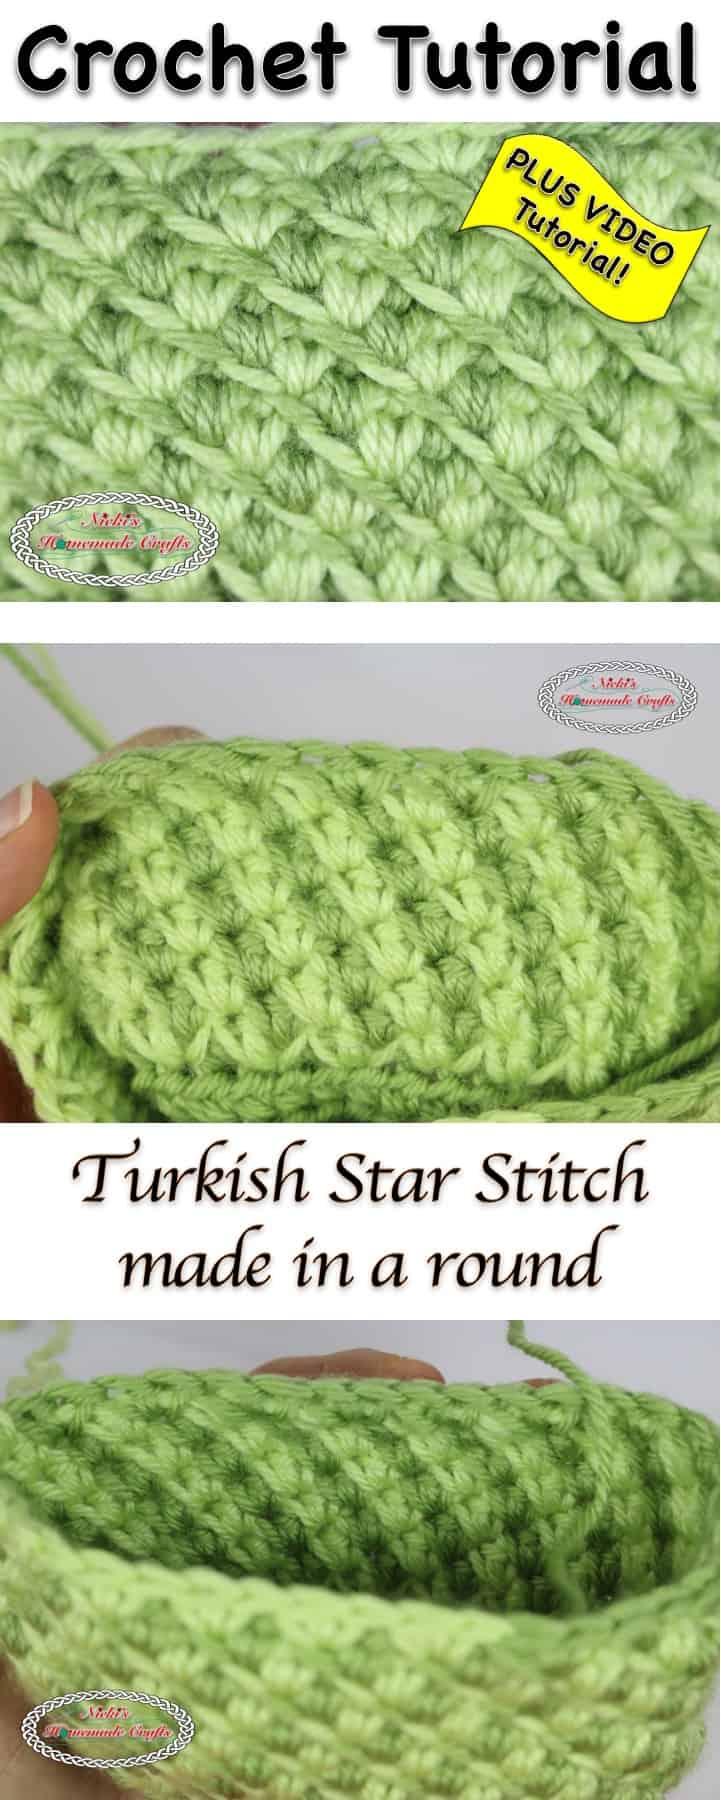 Turkish Star Stitch - Crochet Tutorial by Nicki's Homemade Crafts